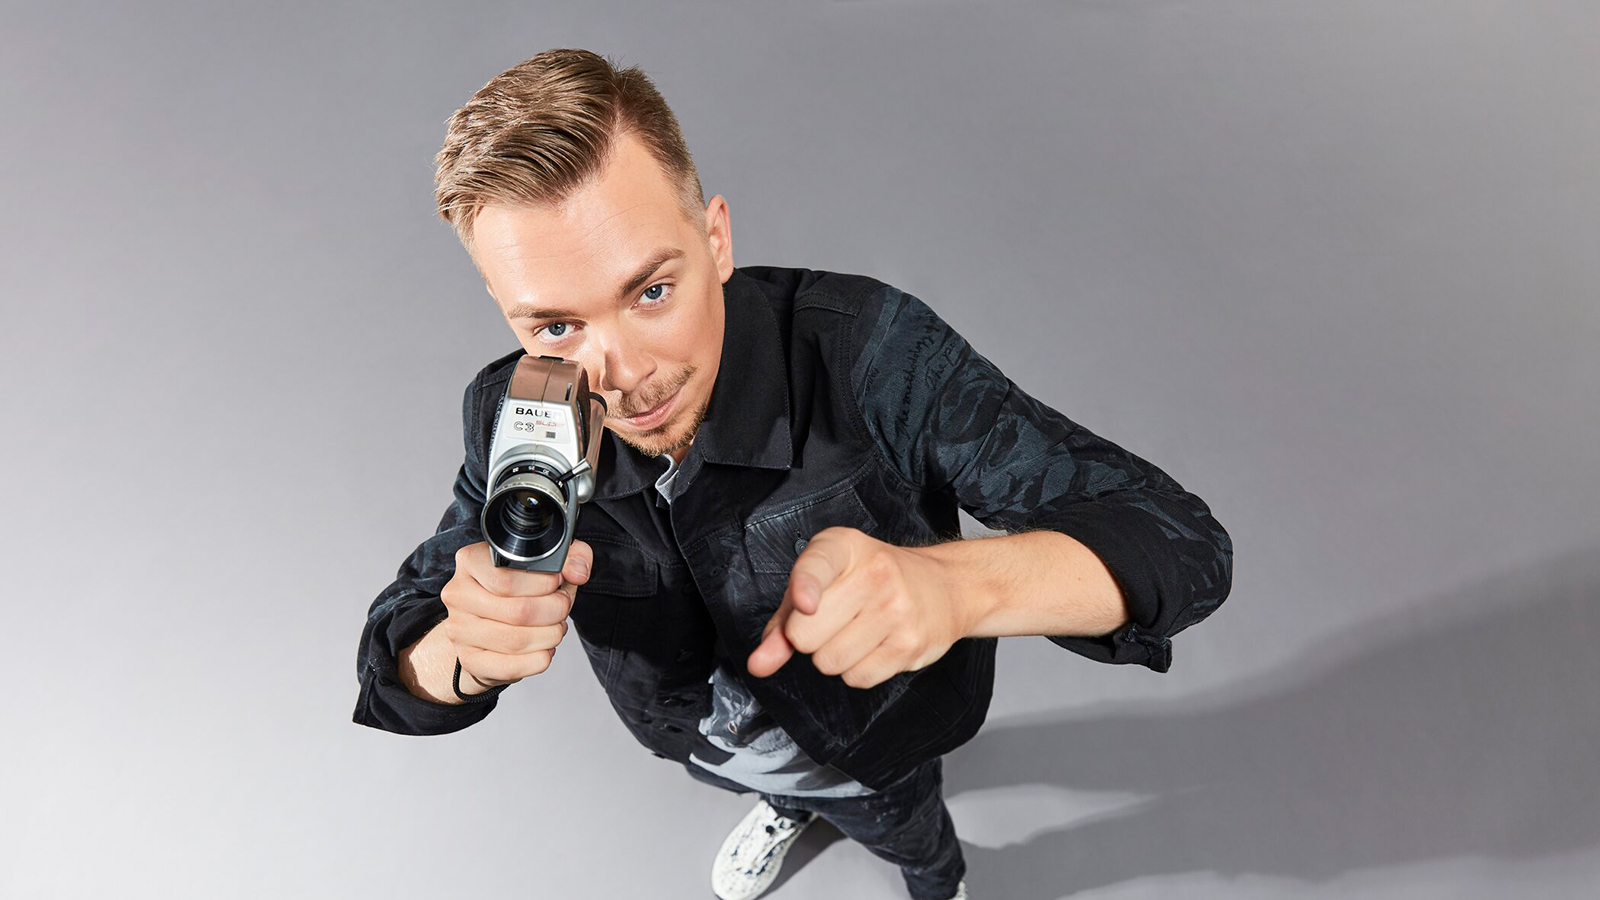 Udo Bönstrup